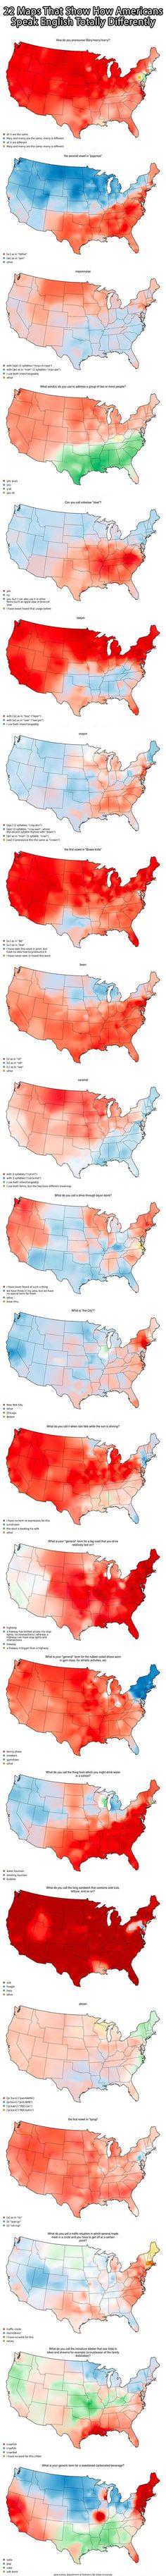 How Americans Speak English